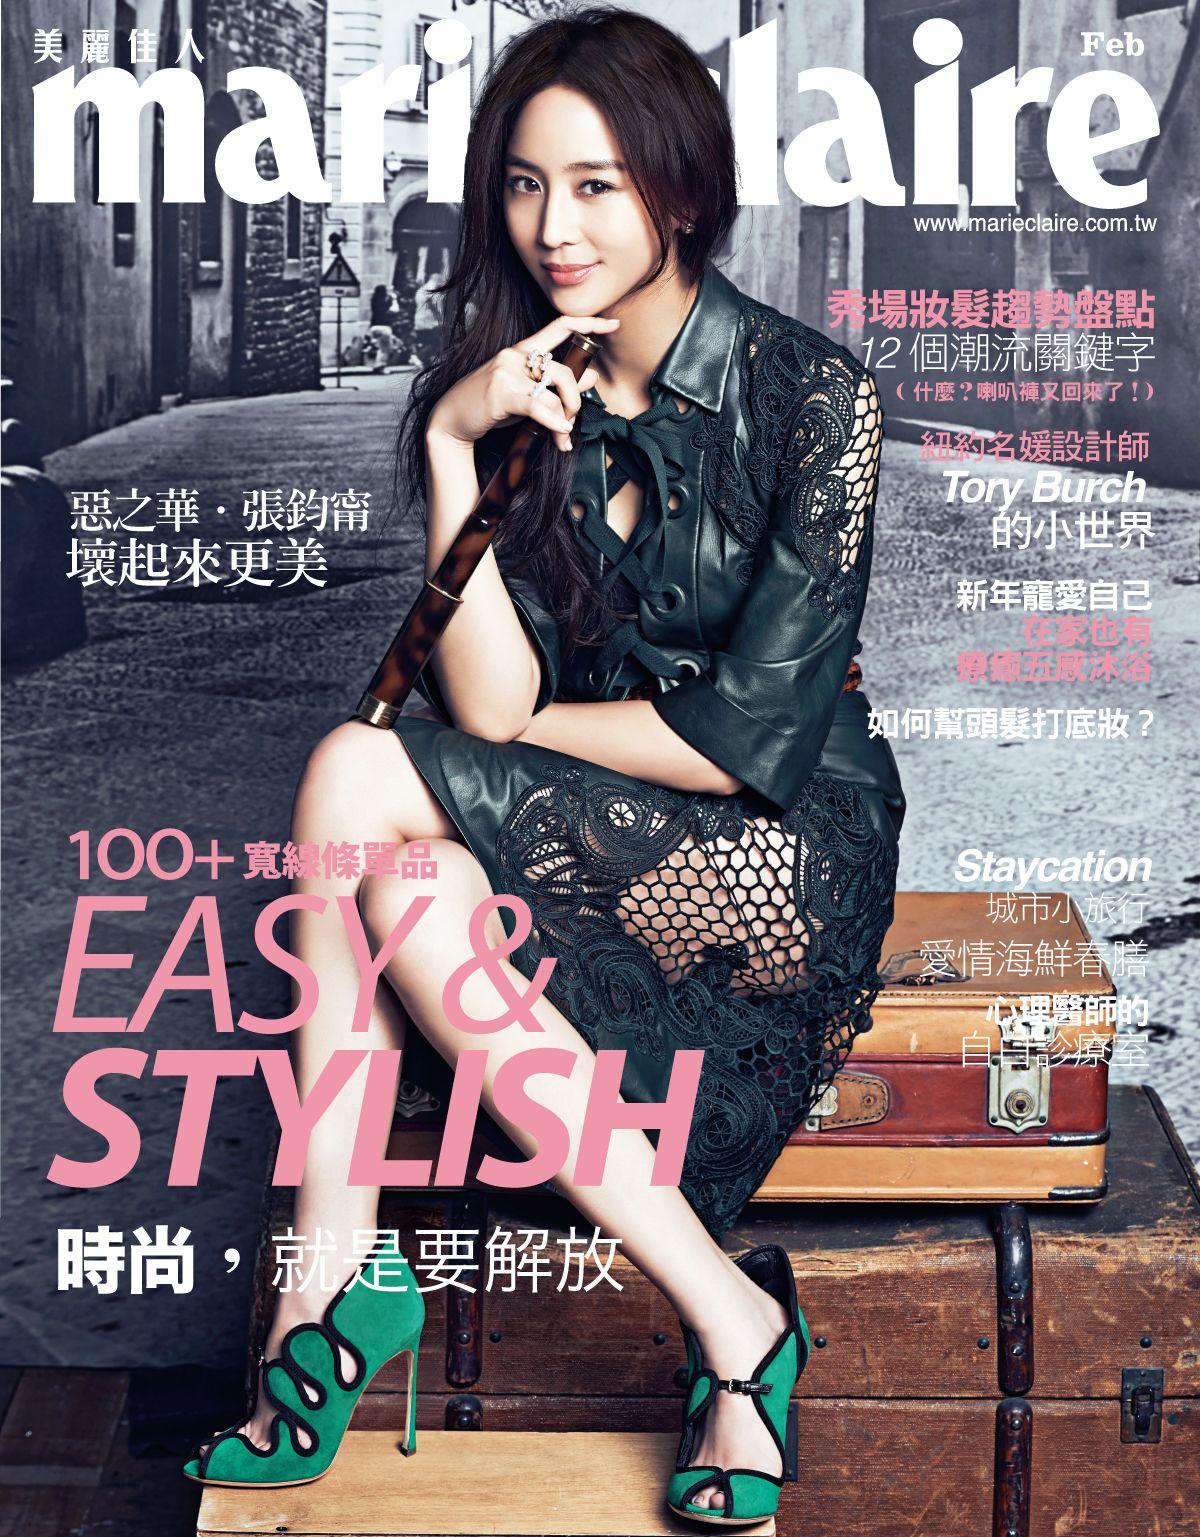 《Marie Claire》Taiwan / 2月號 / 張鈞甯 Photo by╱Ming-Shih Chiang Styling╱Yu Gwen